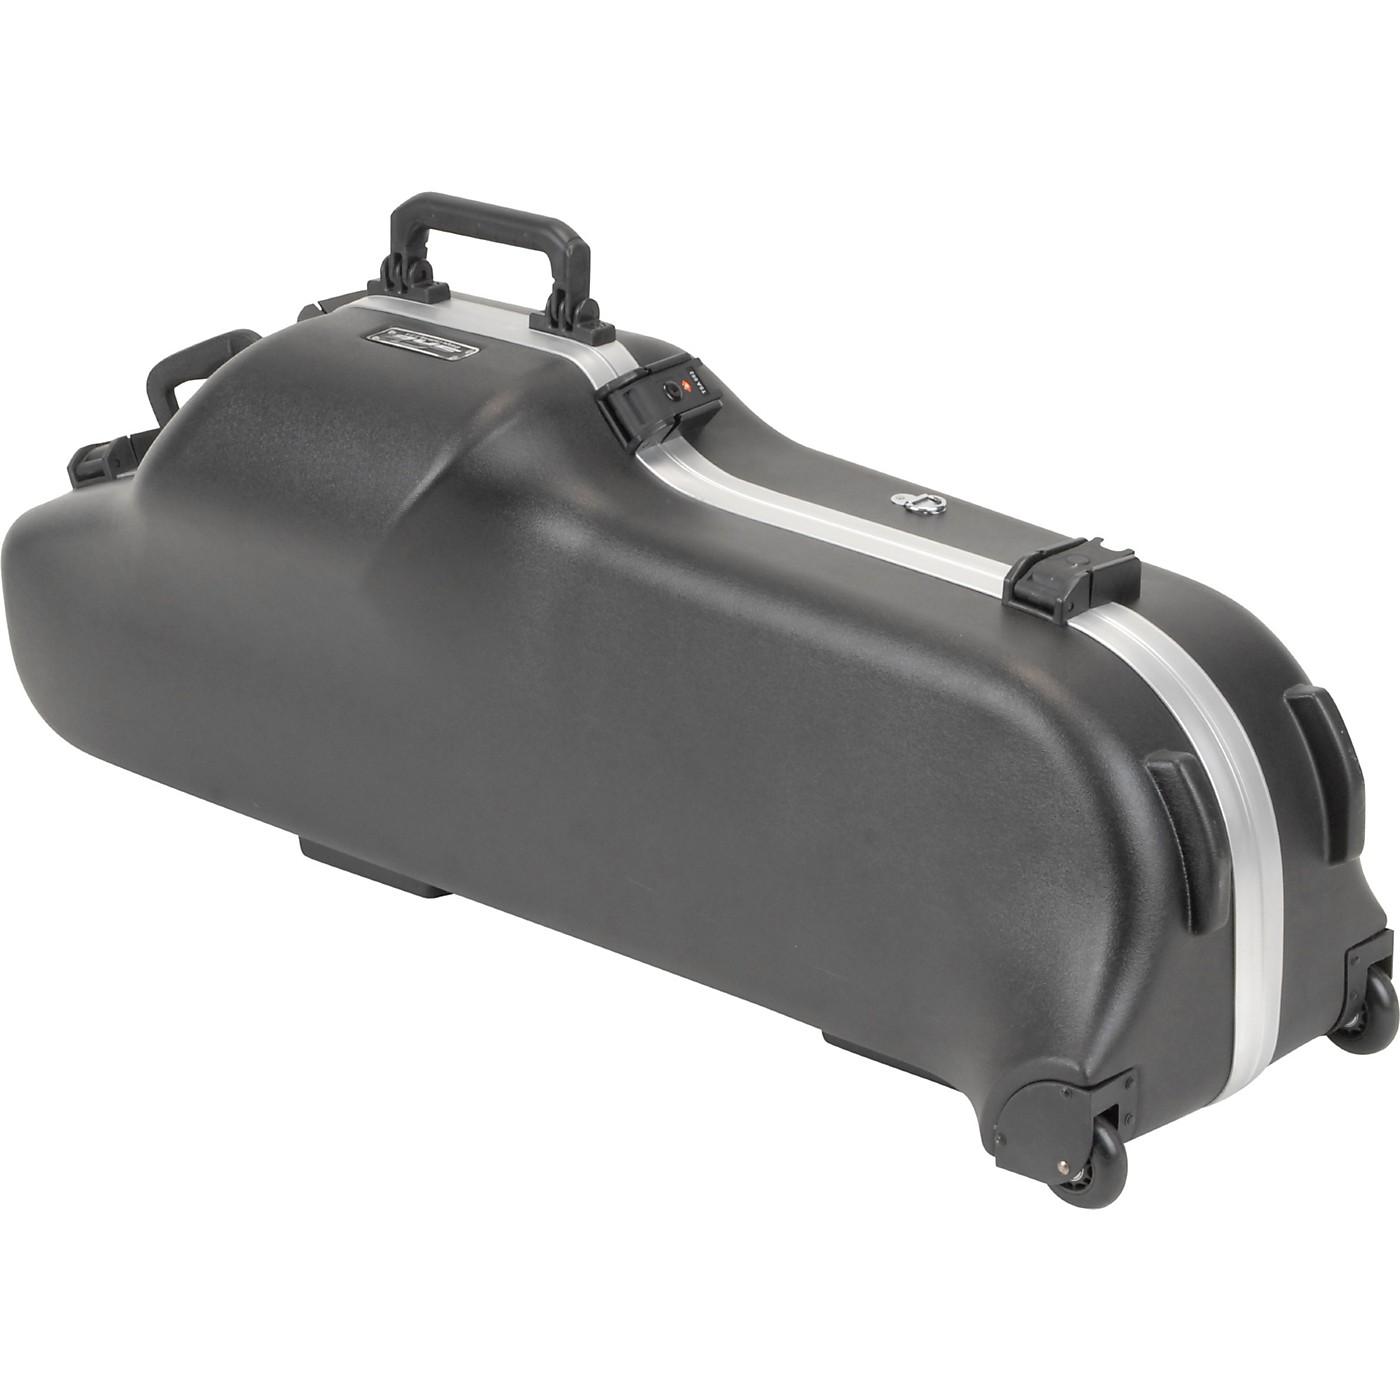 SKB Model 455W Universal Baritone Sax Case with Wheels thumbnail